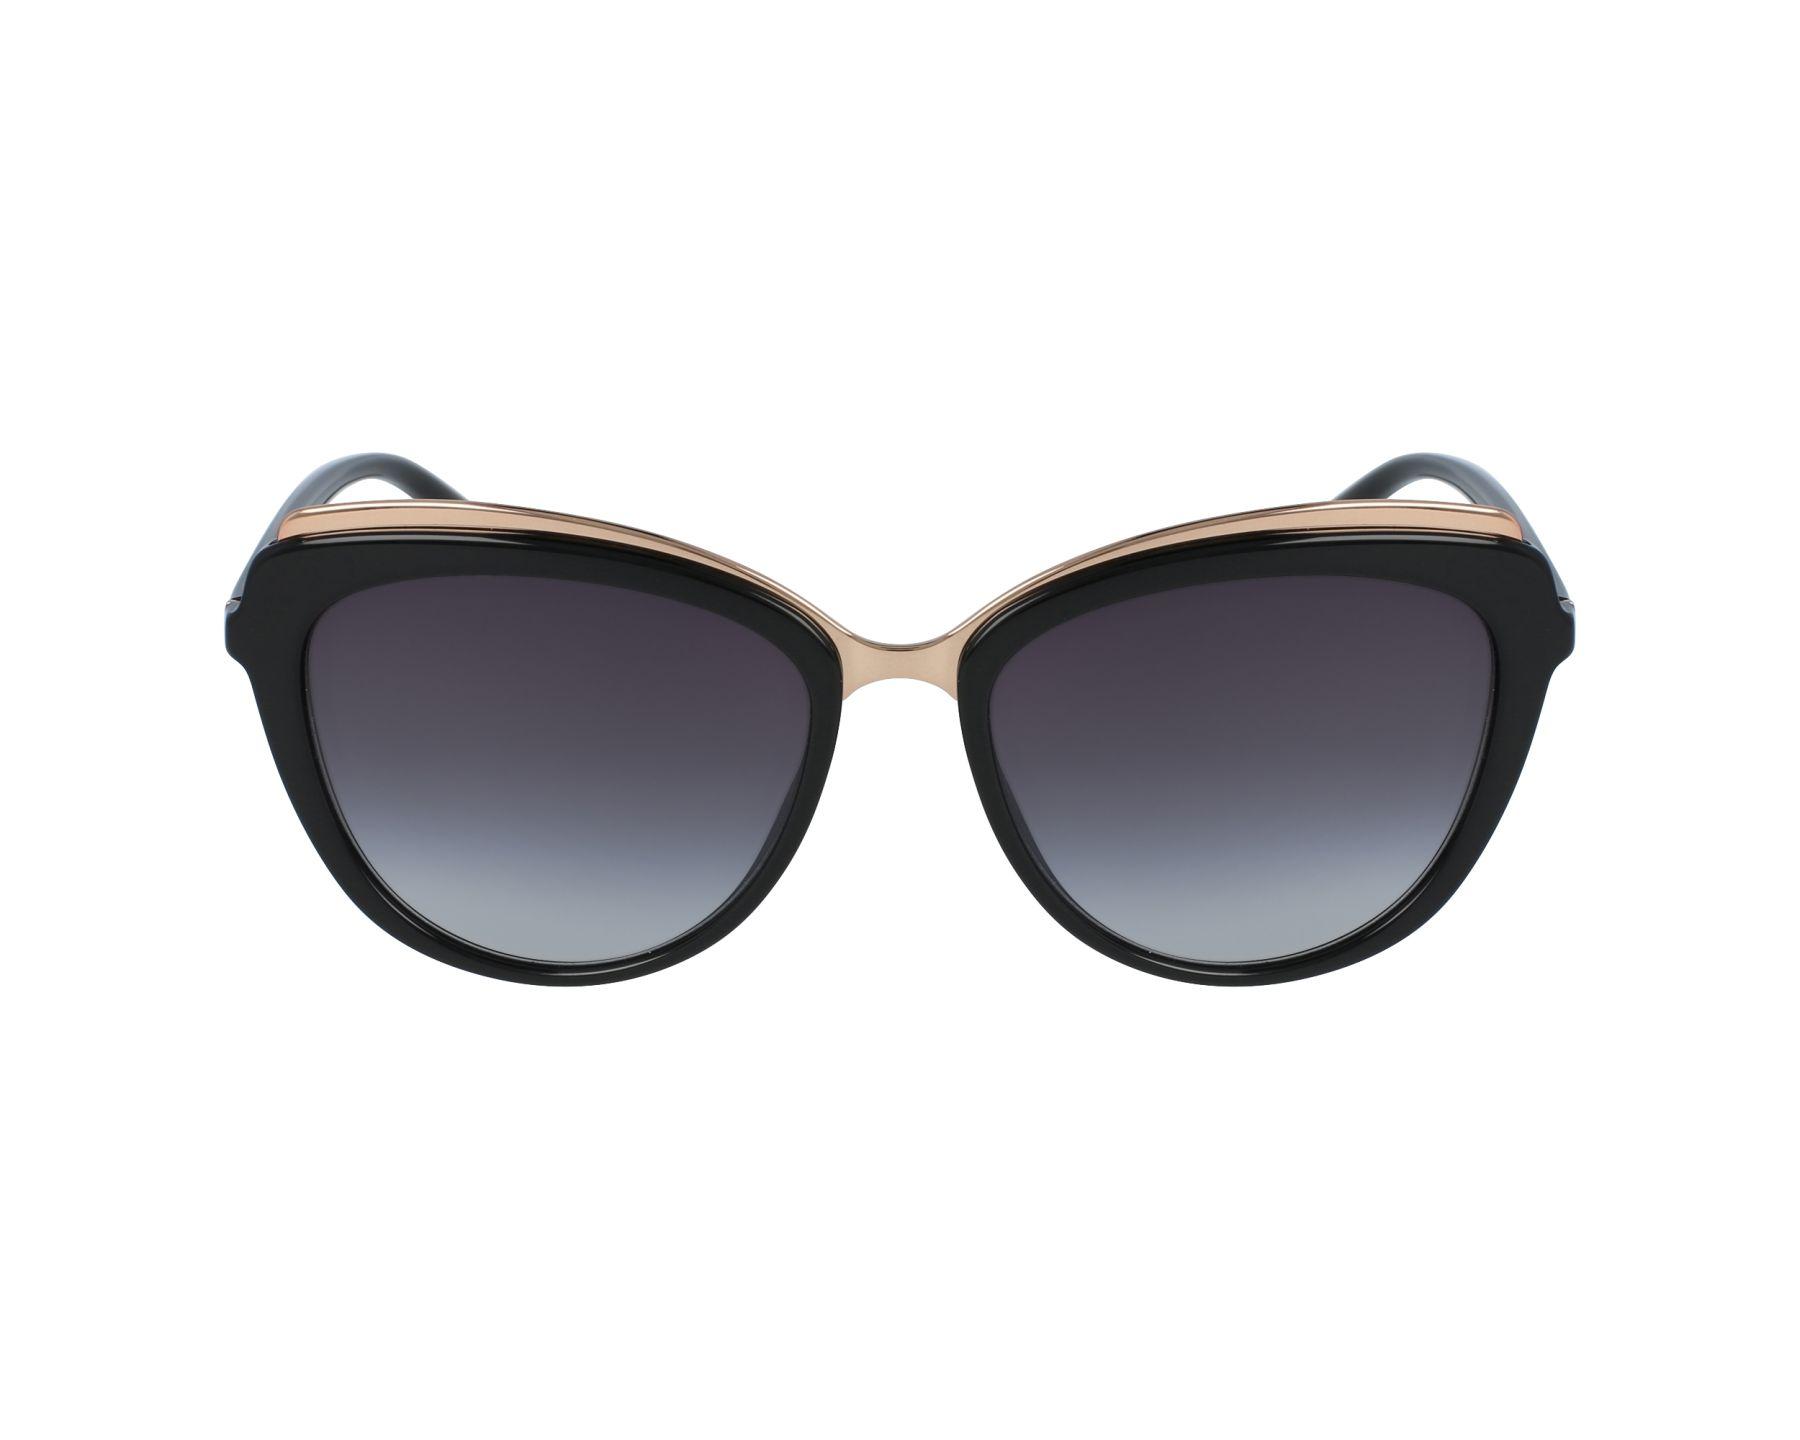 a64cc5c824ed Sunglasses Dolce   Gabbana DG-4304 501 8G 57-17 Black Gold profile